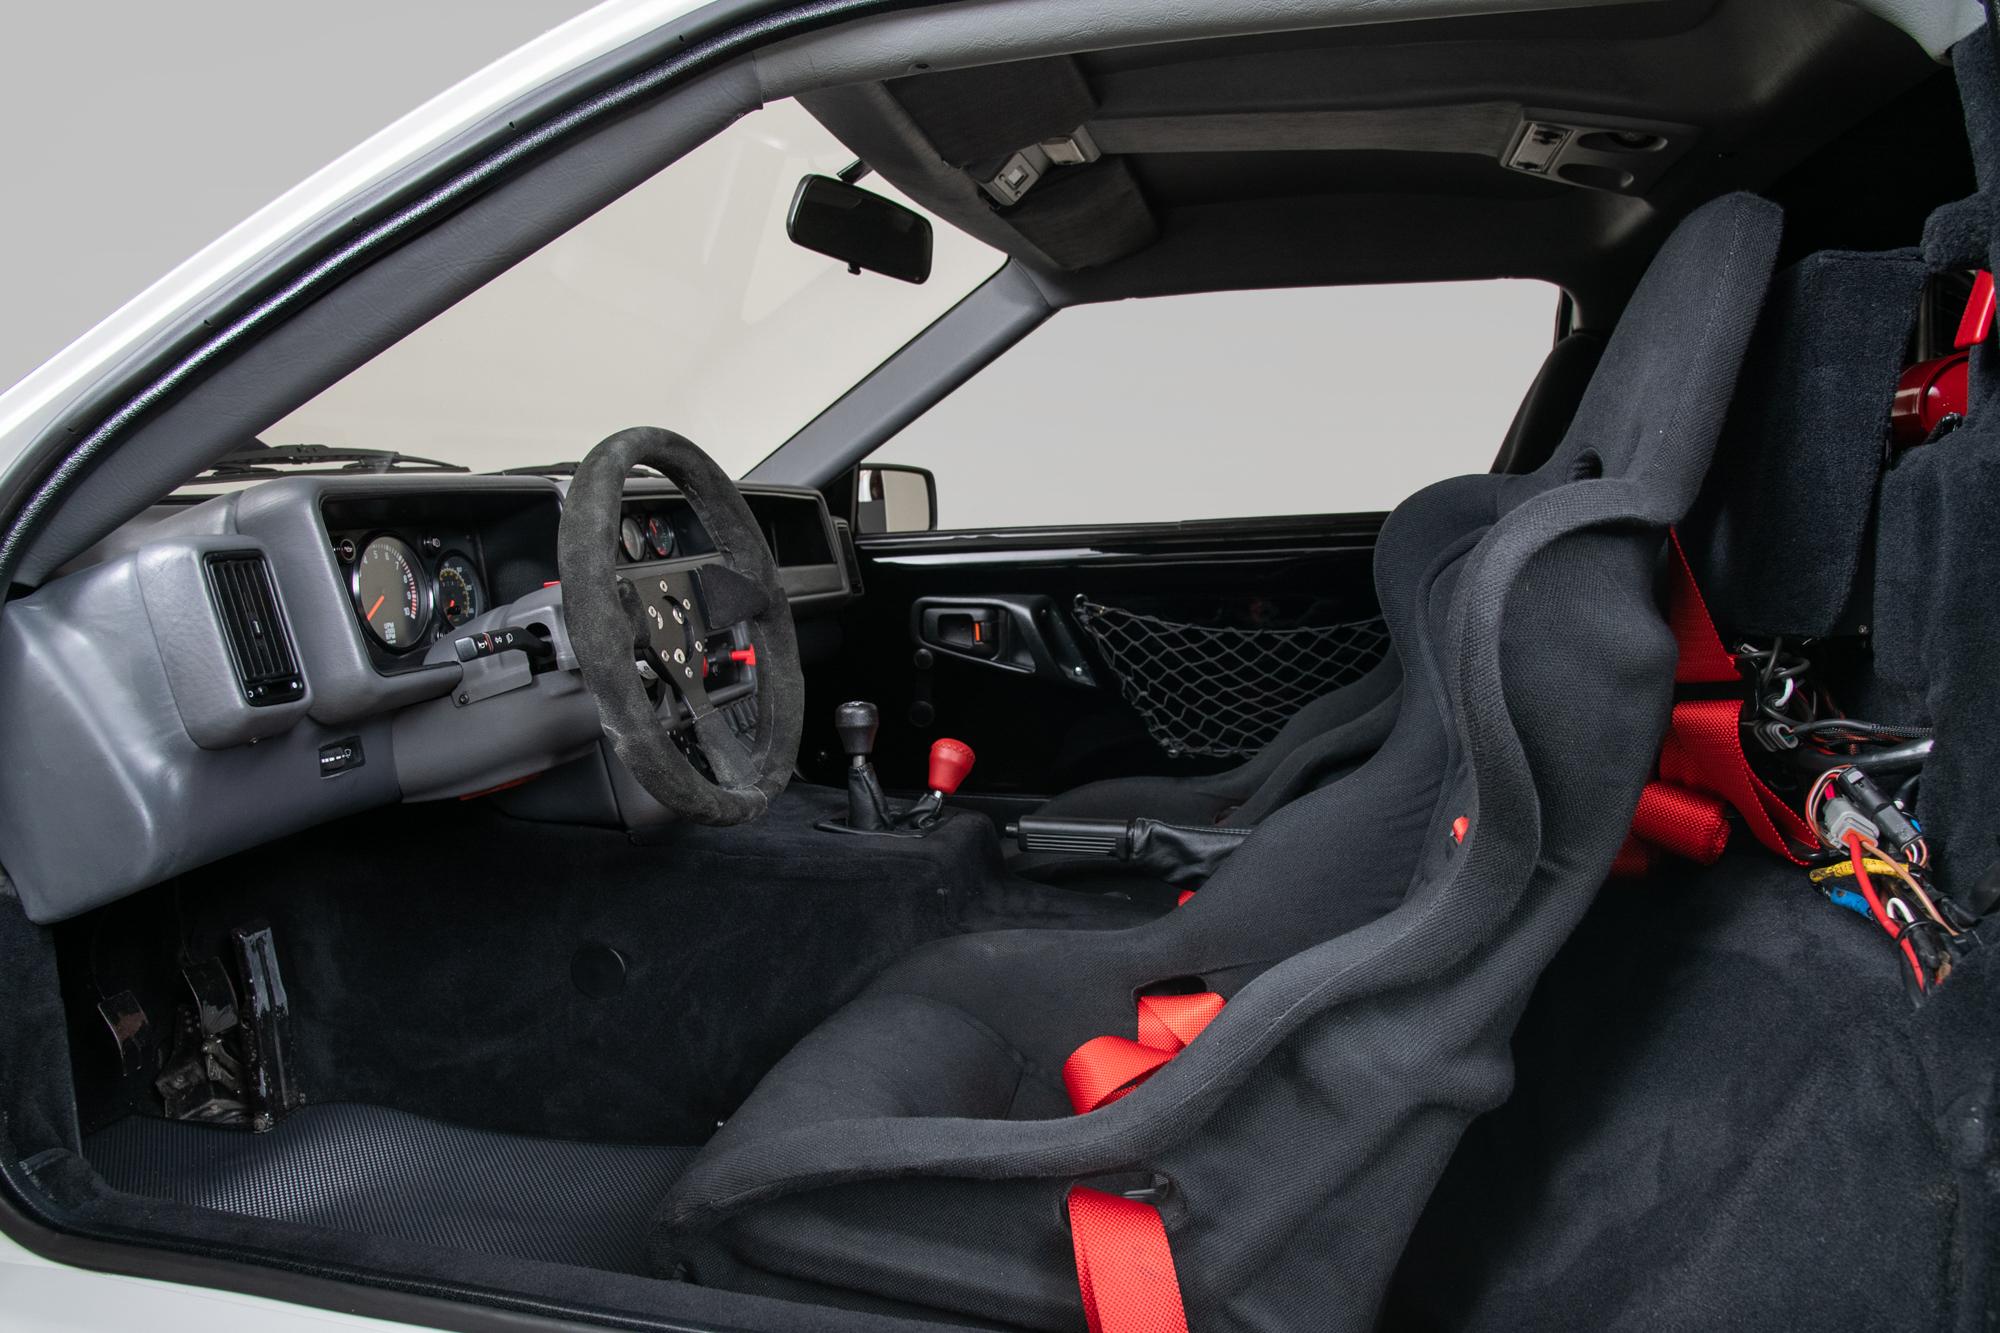 1986 Ford RS200 Evolution, WHITE, VIN SFACXX8J2CGL00106, MILEAGE 10435